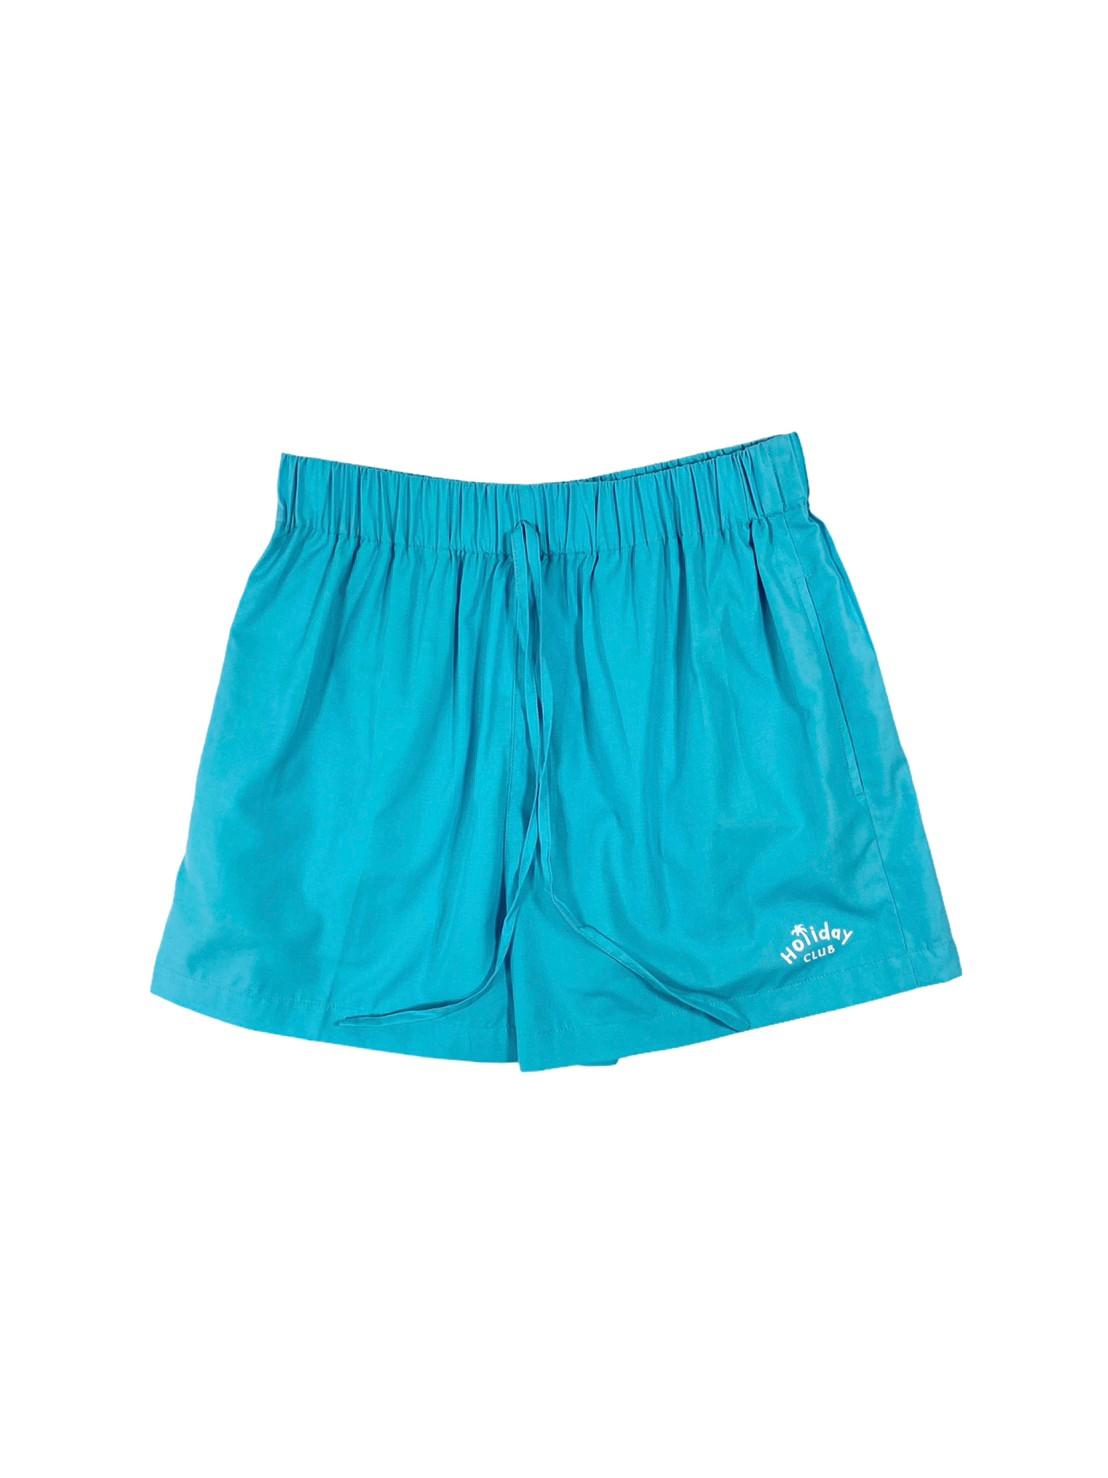 Holiday club shorts (Sky blue)